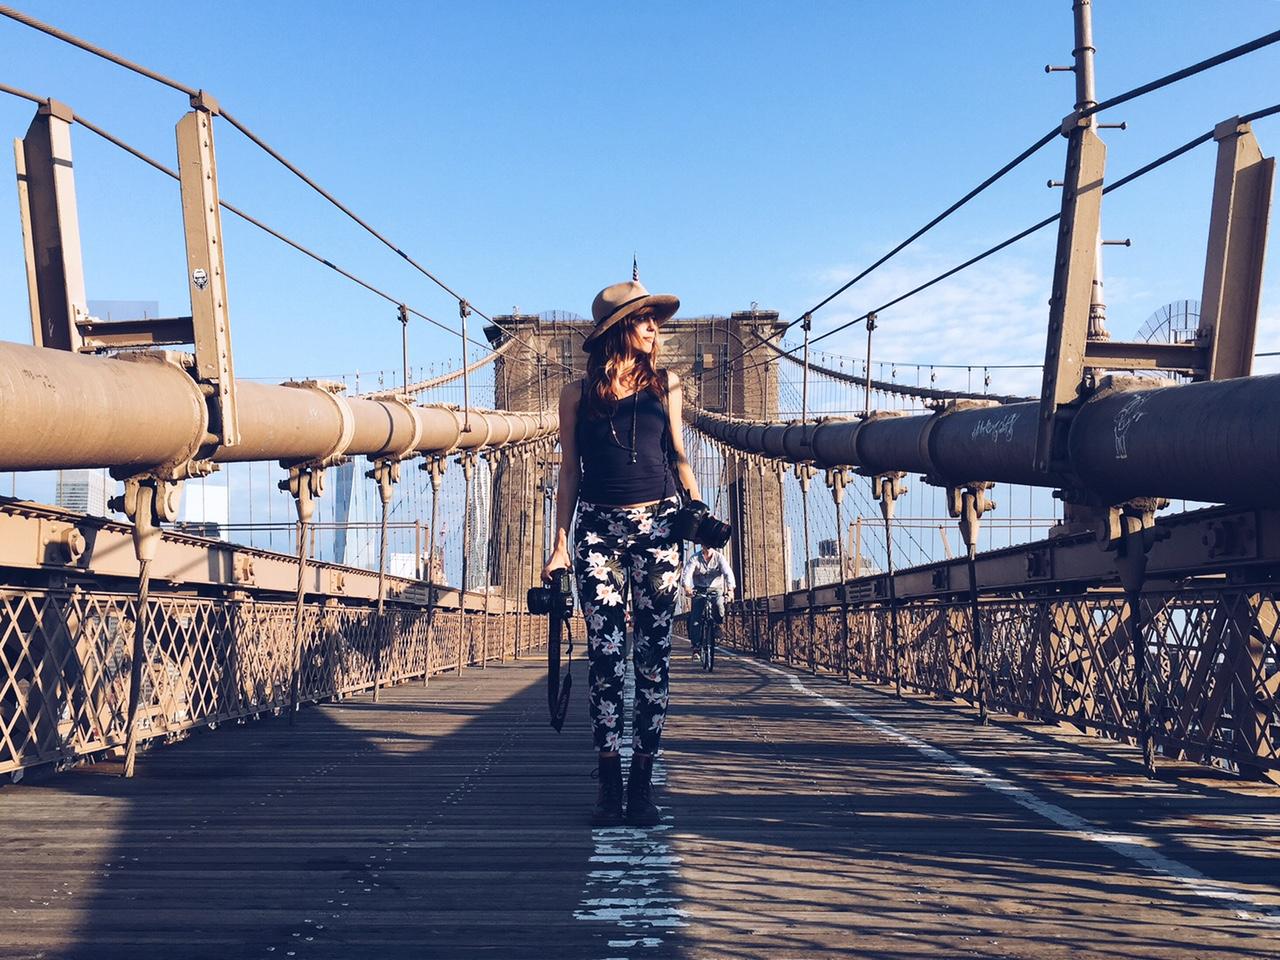 cadence feeley on the brooklyn bridge, new york city